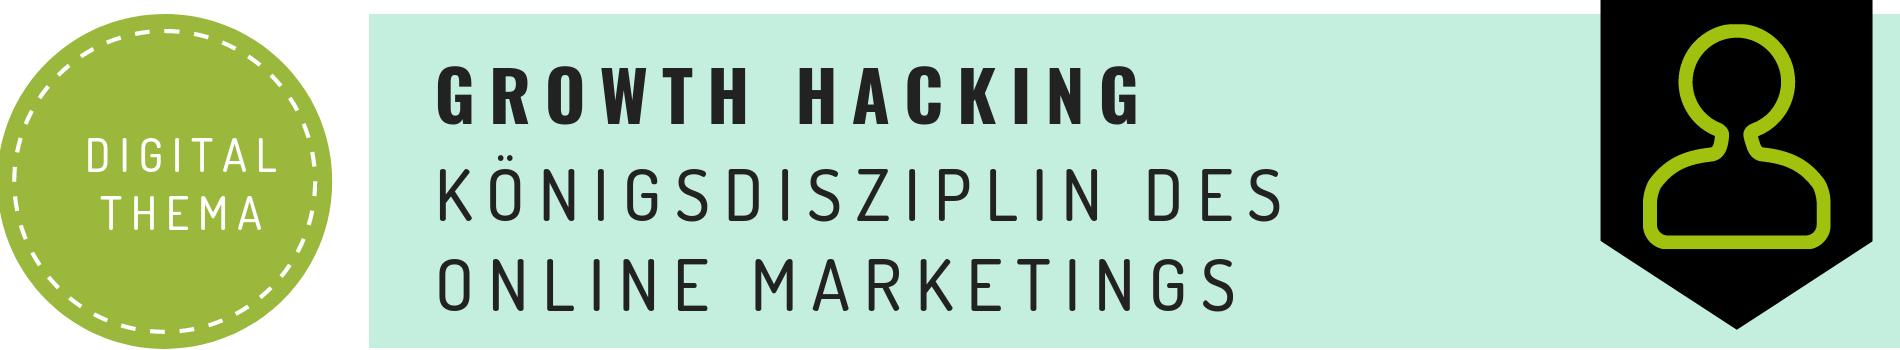 Growth Hack ist Königsdisziplin im Online Marketing | DIGITAL Marketing Expert